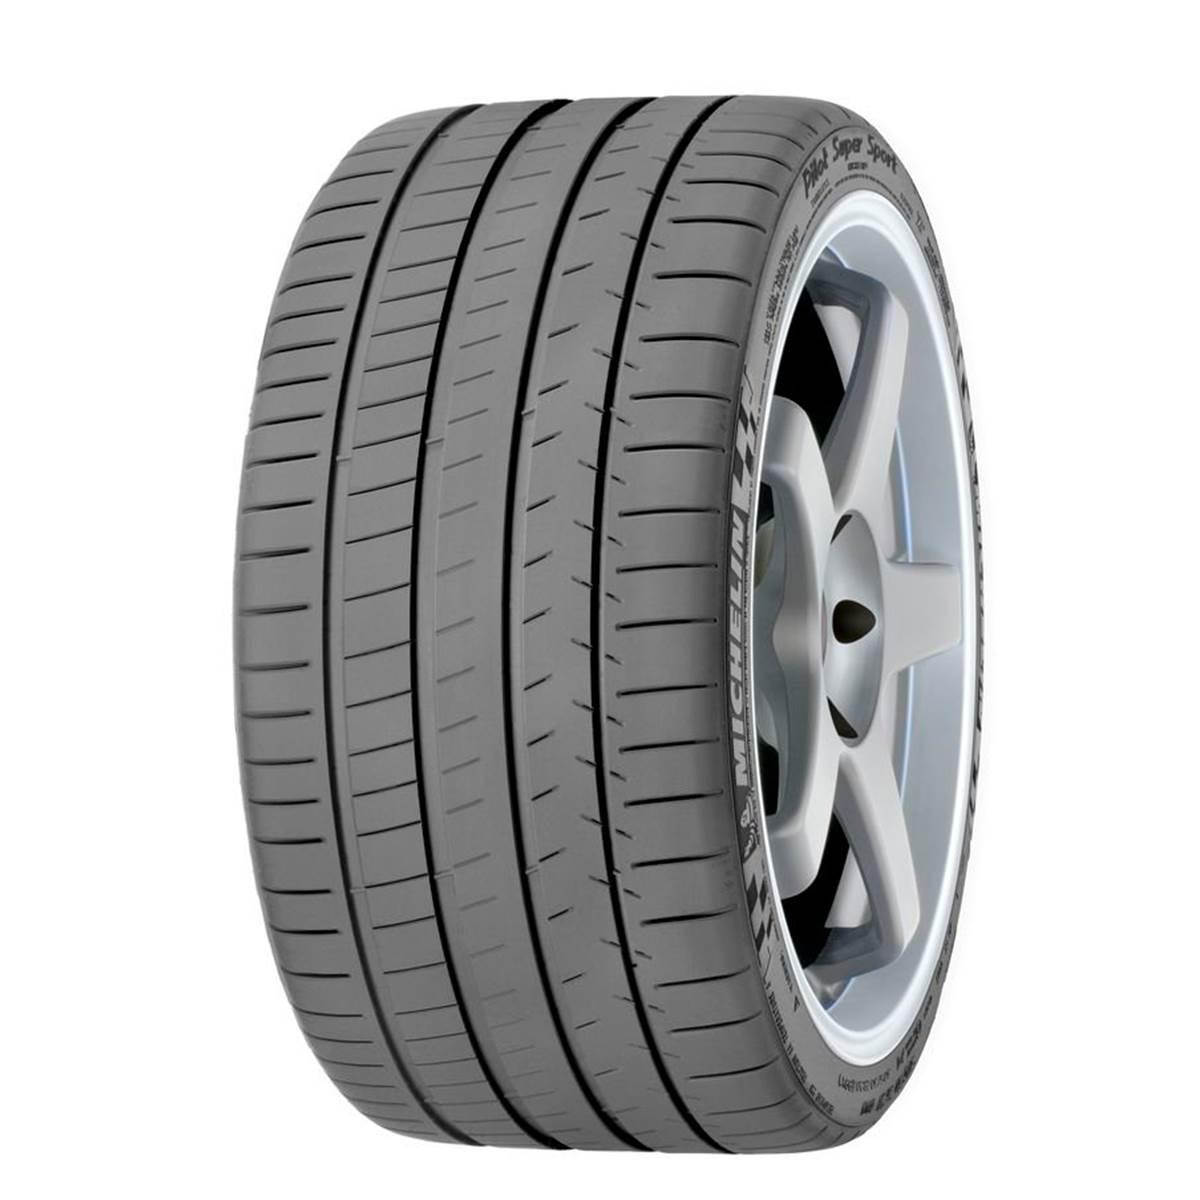 Pneu Michelin 255/40R20 101Y Pilot Super Sport XL